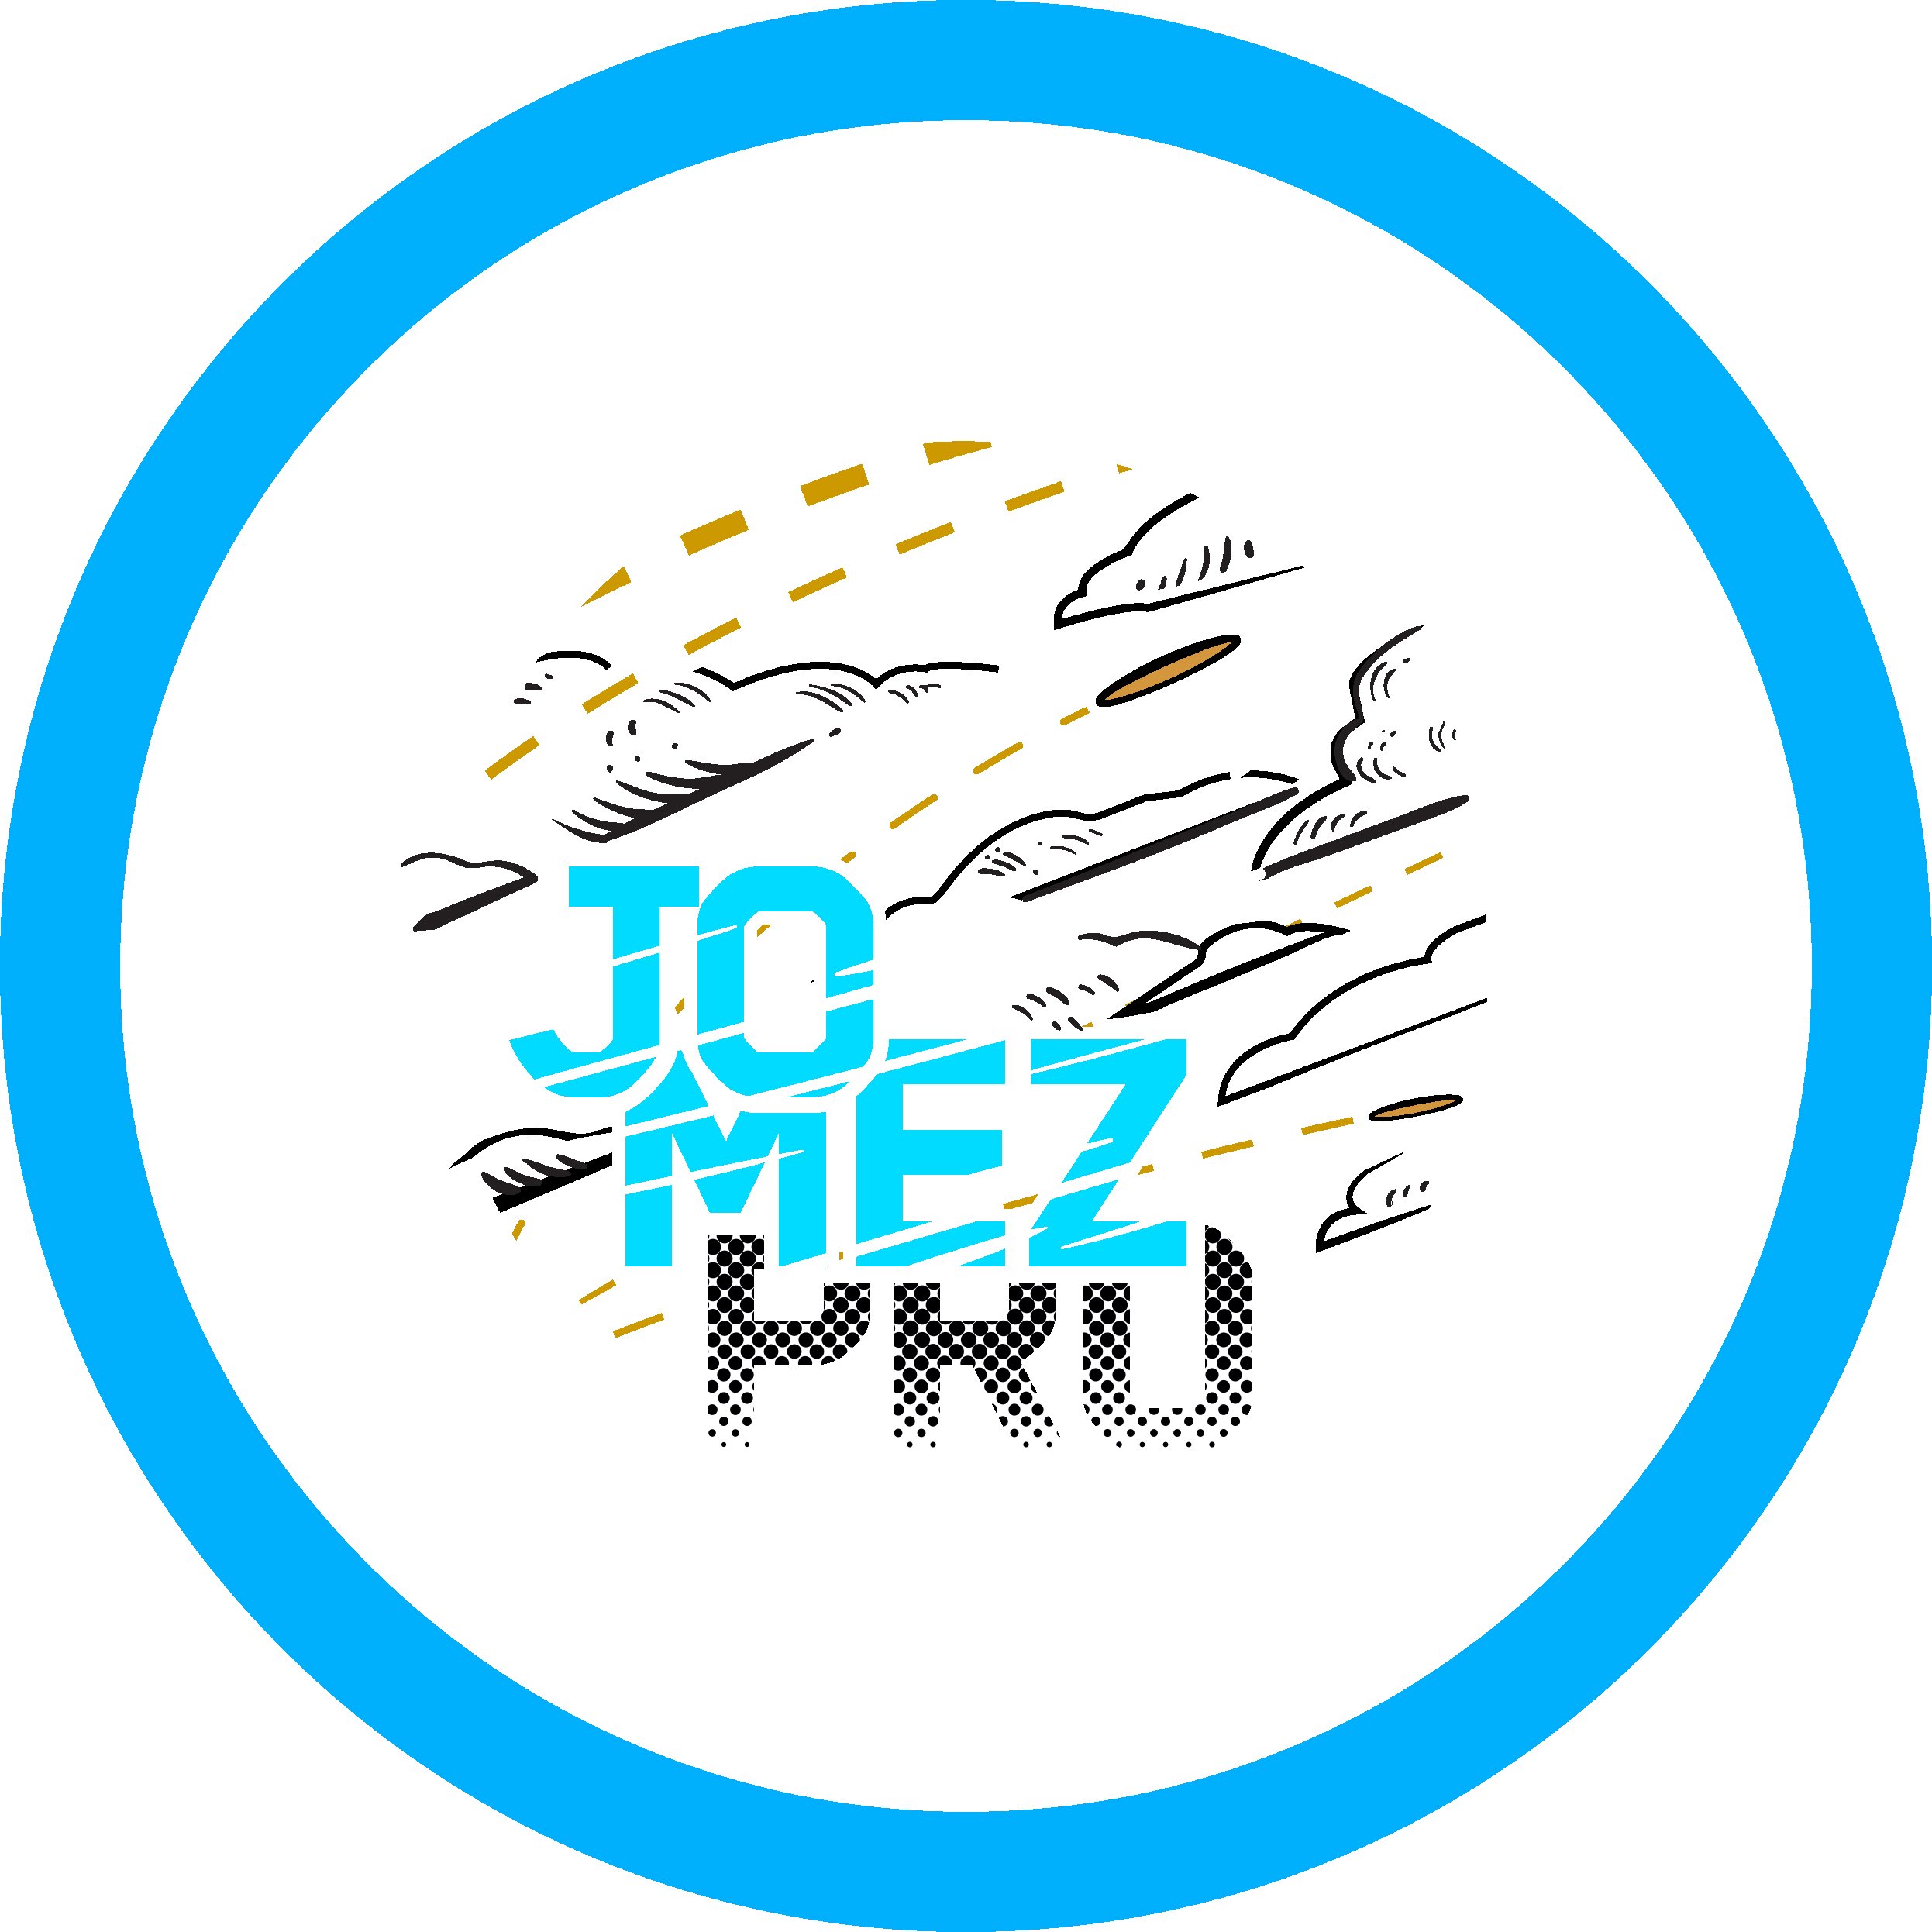 JomezPro_Prog_004.jpg